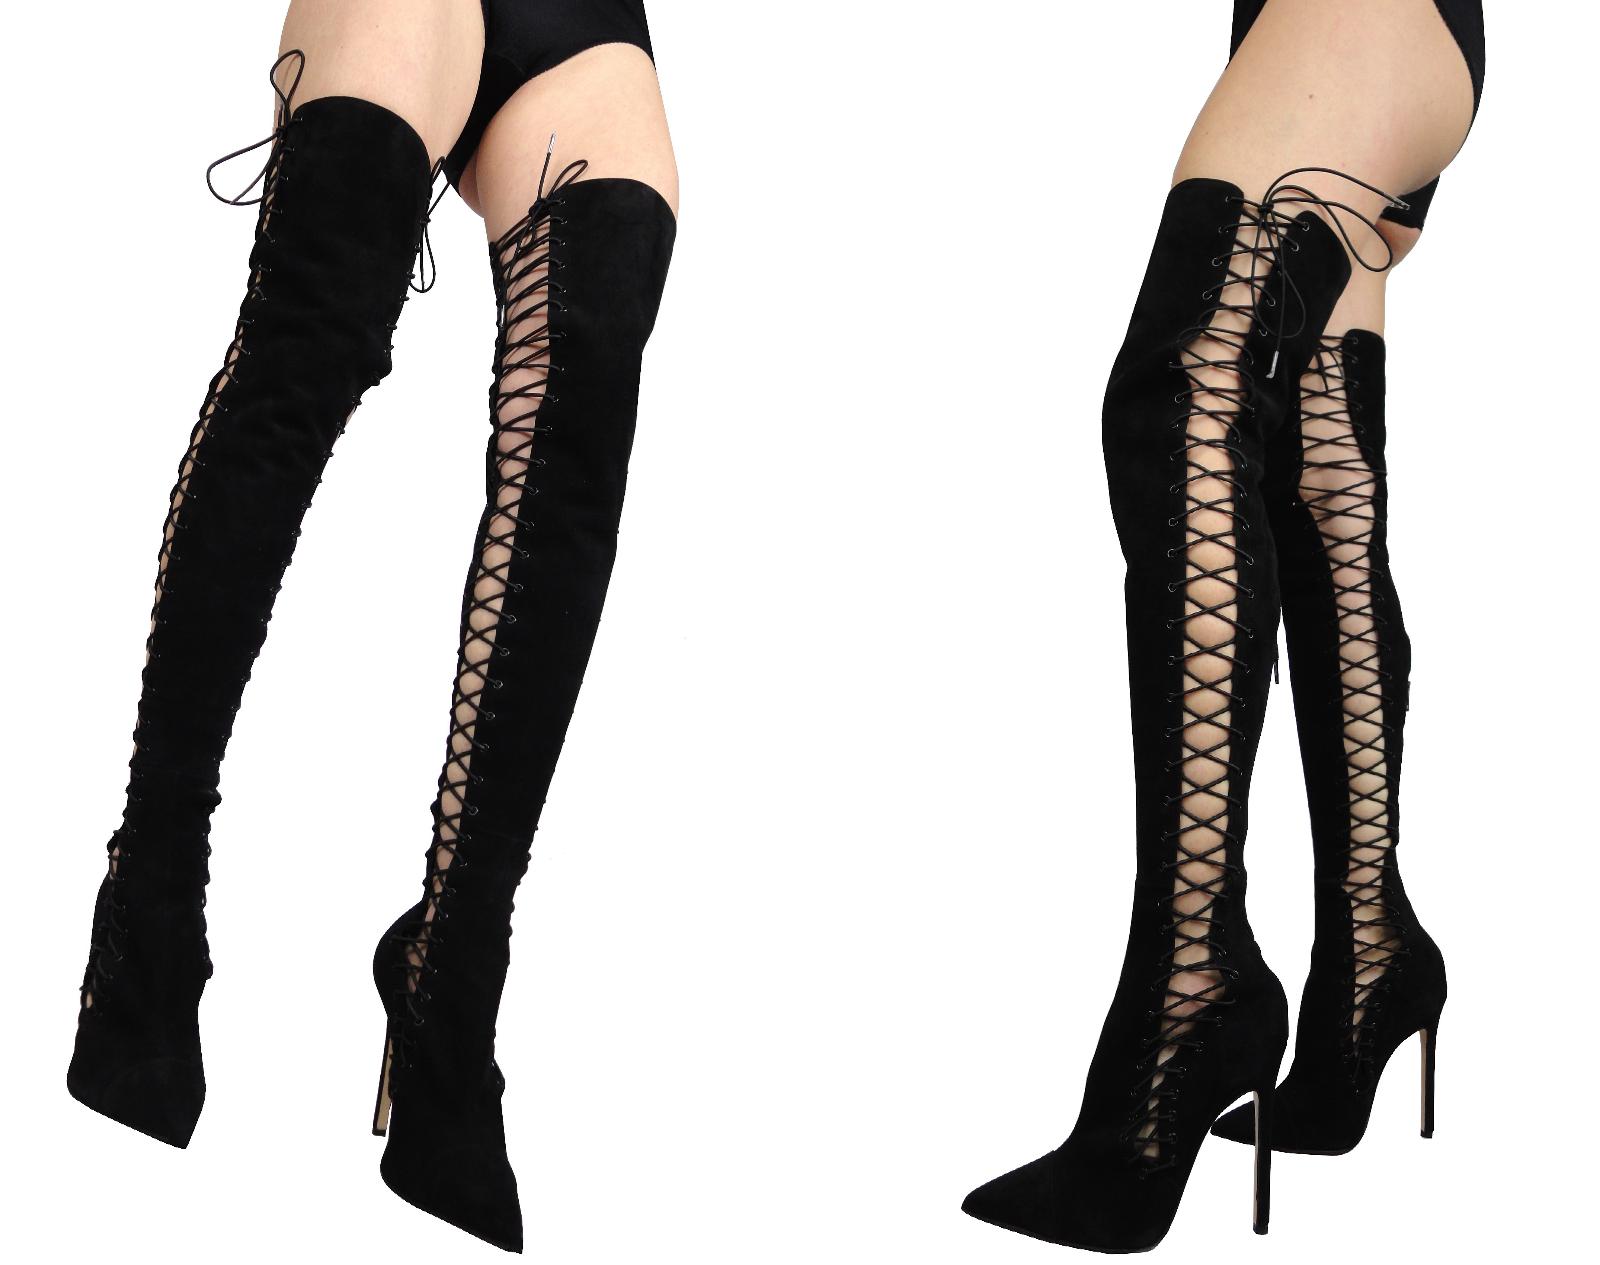 Zapatos de mujer baratos zapatos de mujer CUSTOM GIOHEL ITALY CUSTOM mujer CORSé OVERKNEE BOOTS STIEFEL BOTAS ANTE BLACK NEGRO 42 dc4236